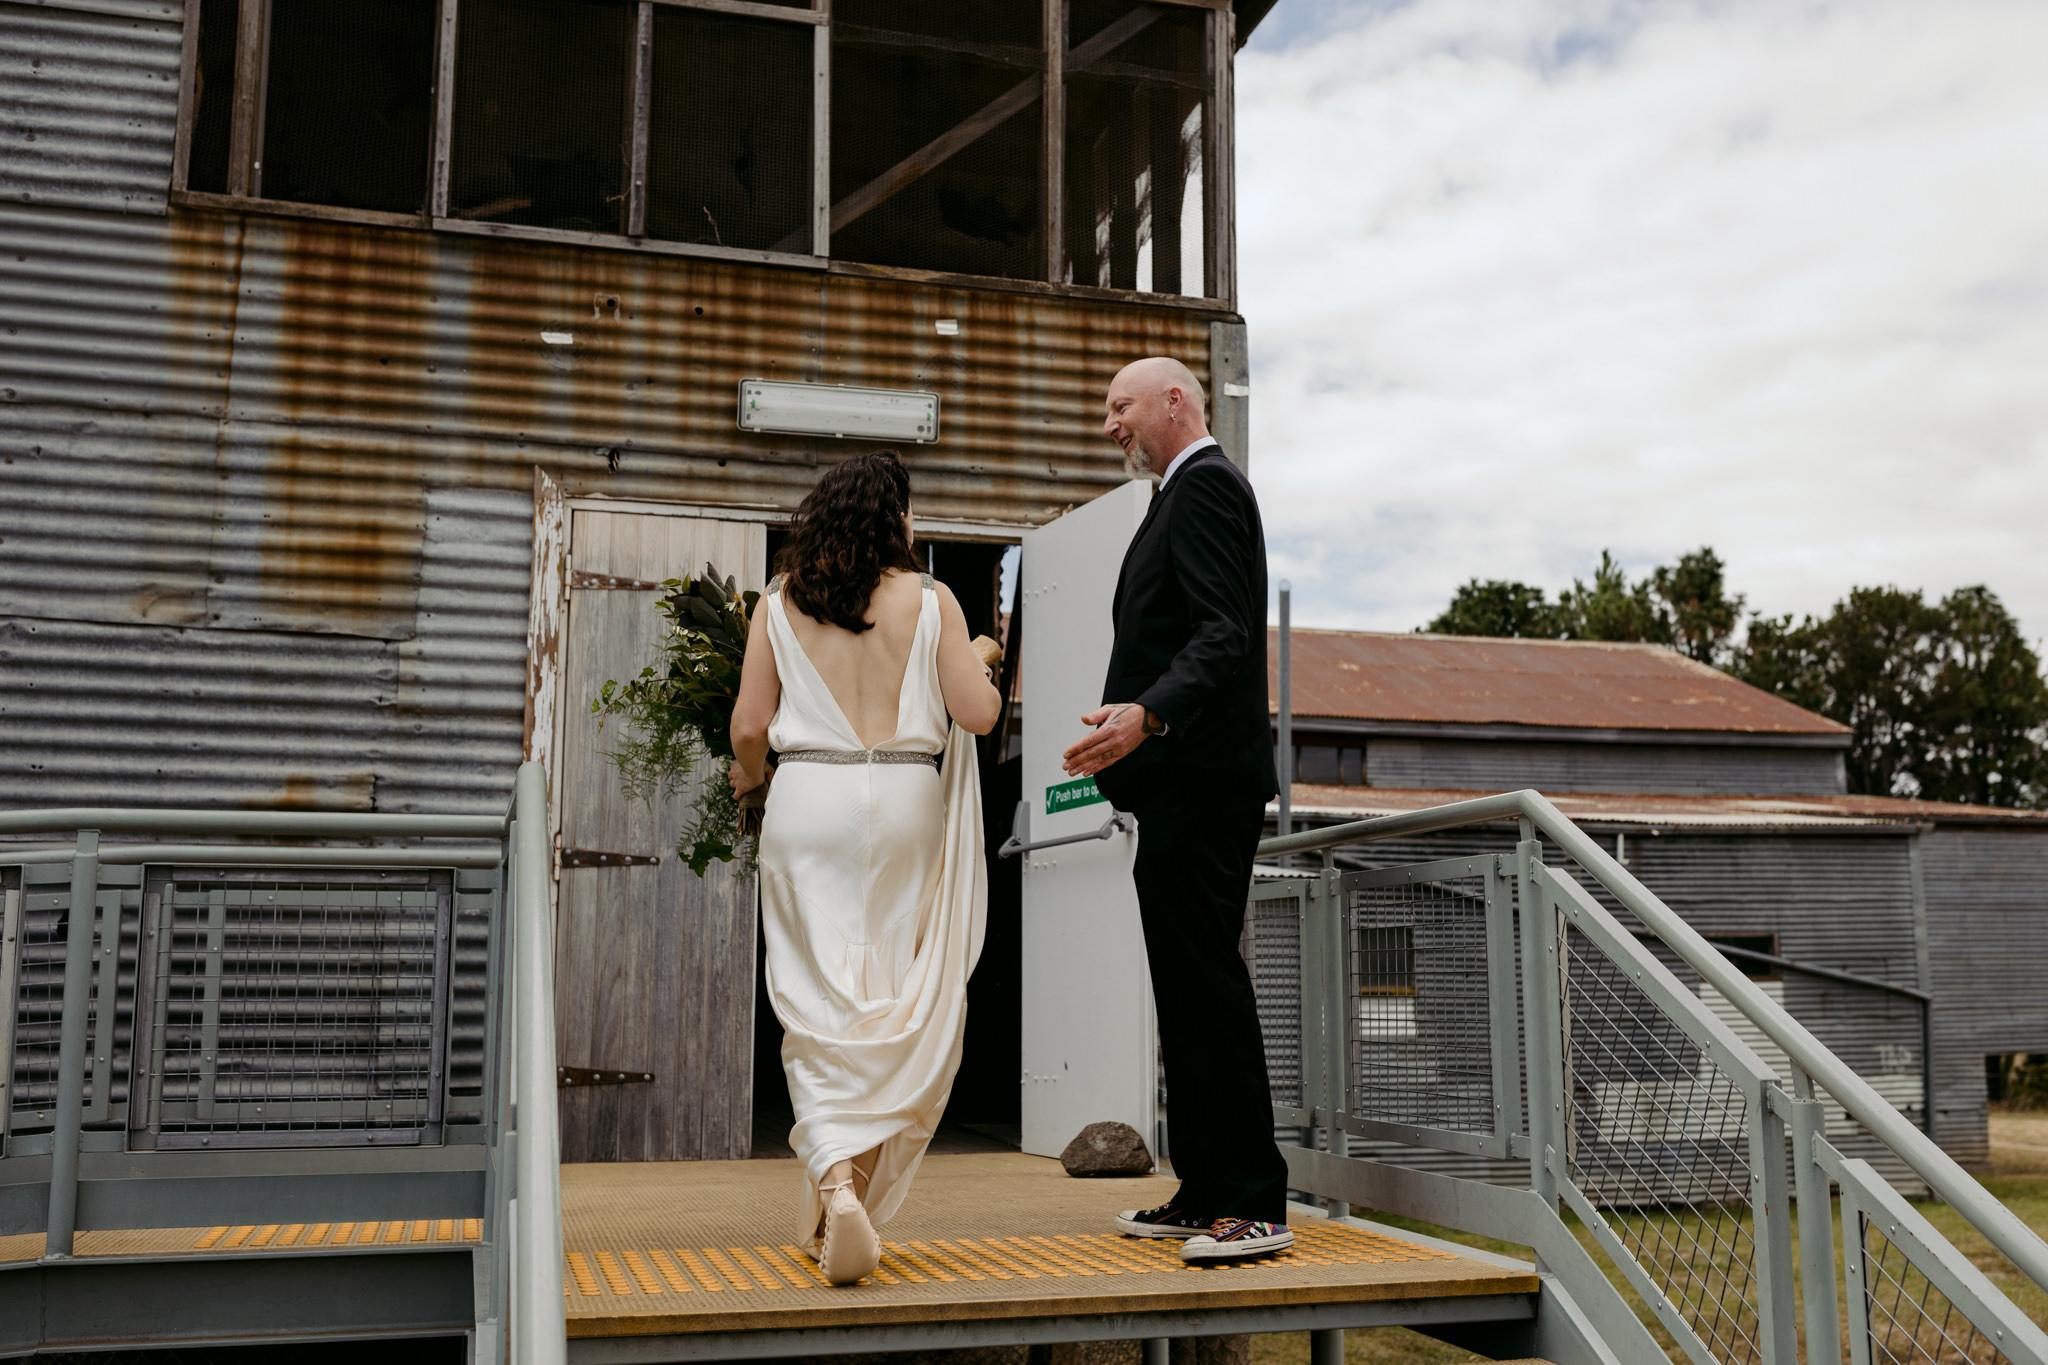 Yarralumla Woolshed Canberra Wedding Photographer Erin Latimore_036.JPG